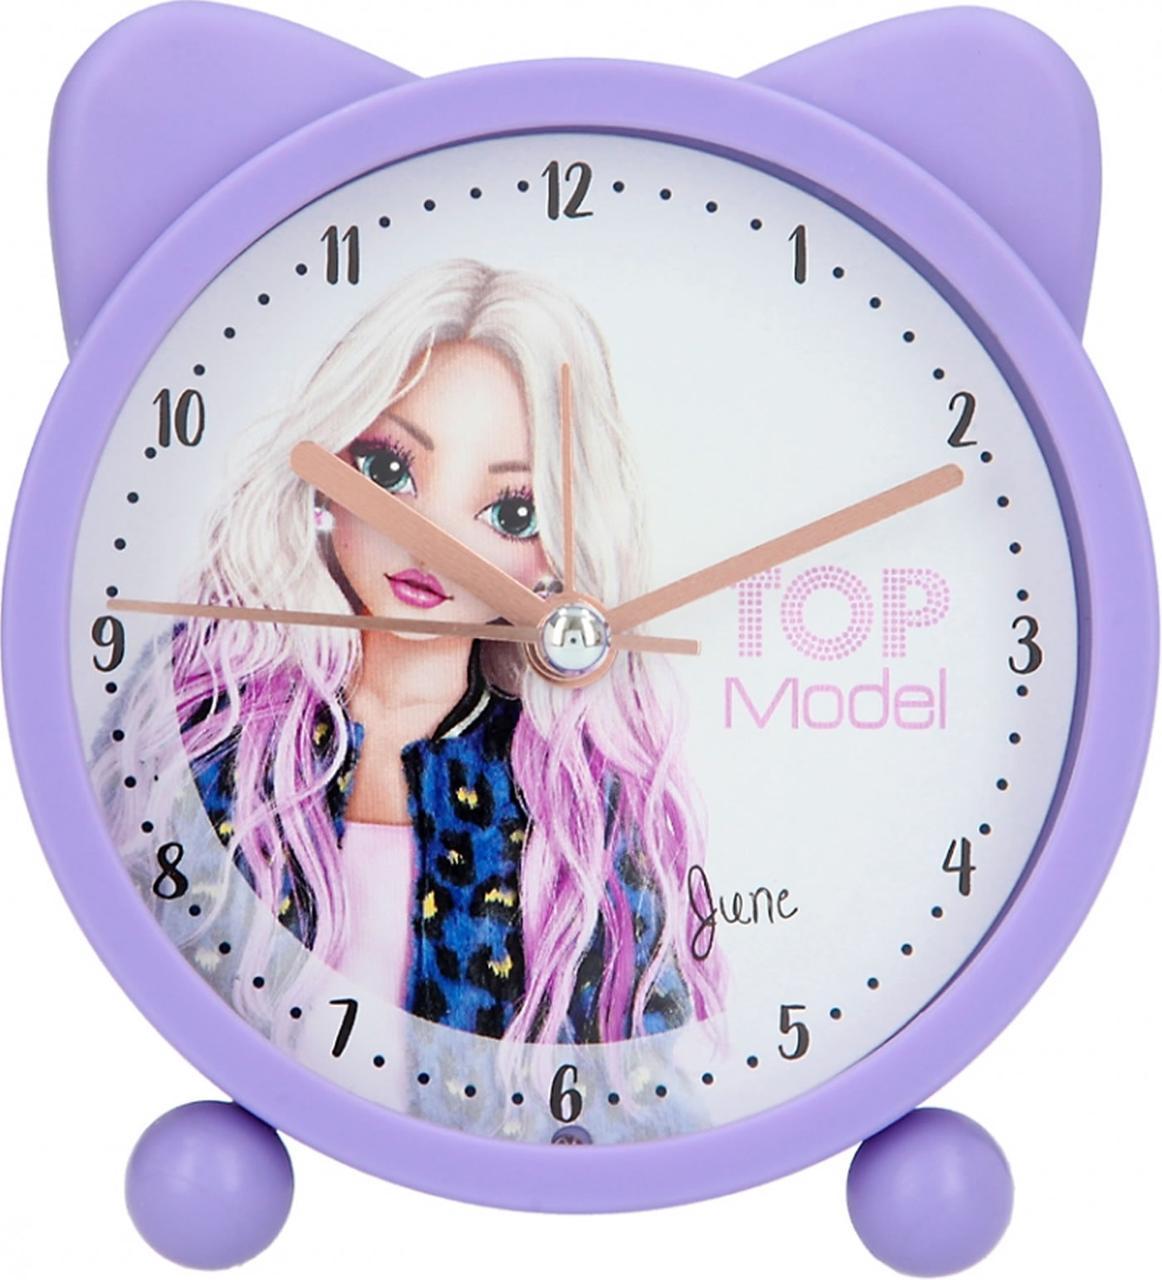 TOP Model часы будильник June из серии LEO LOVE (Топ Модел будильник в кошачьем стиле Depesche 4790)